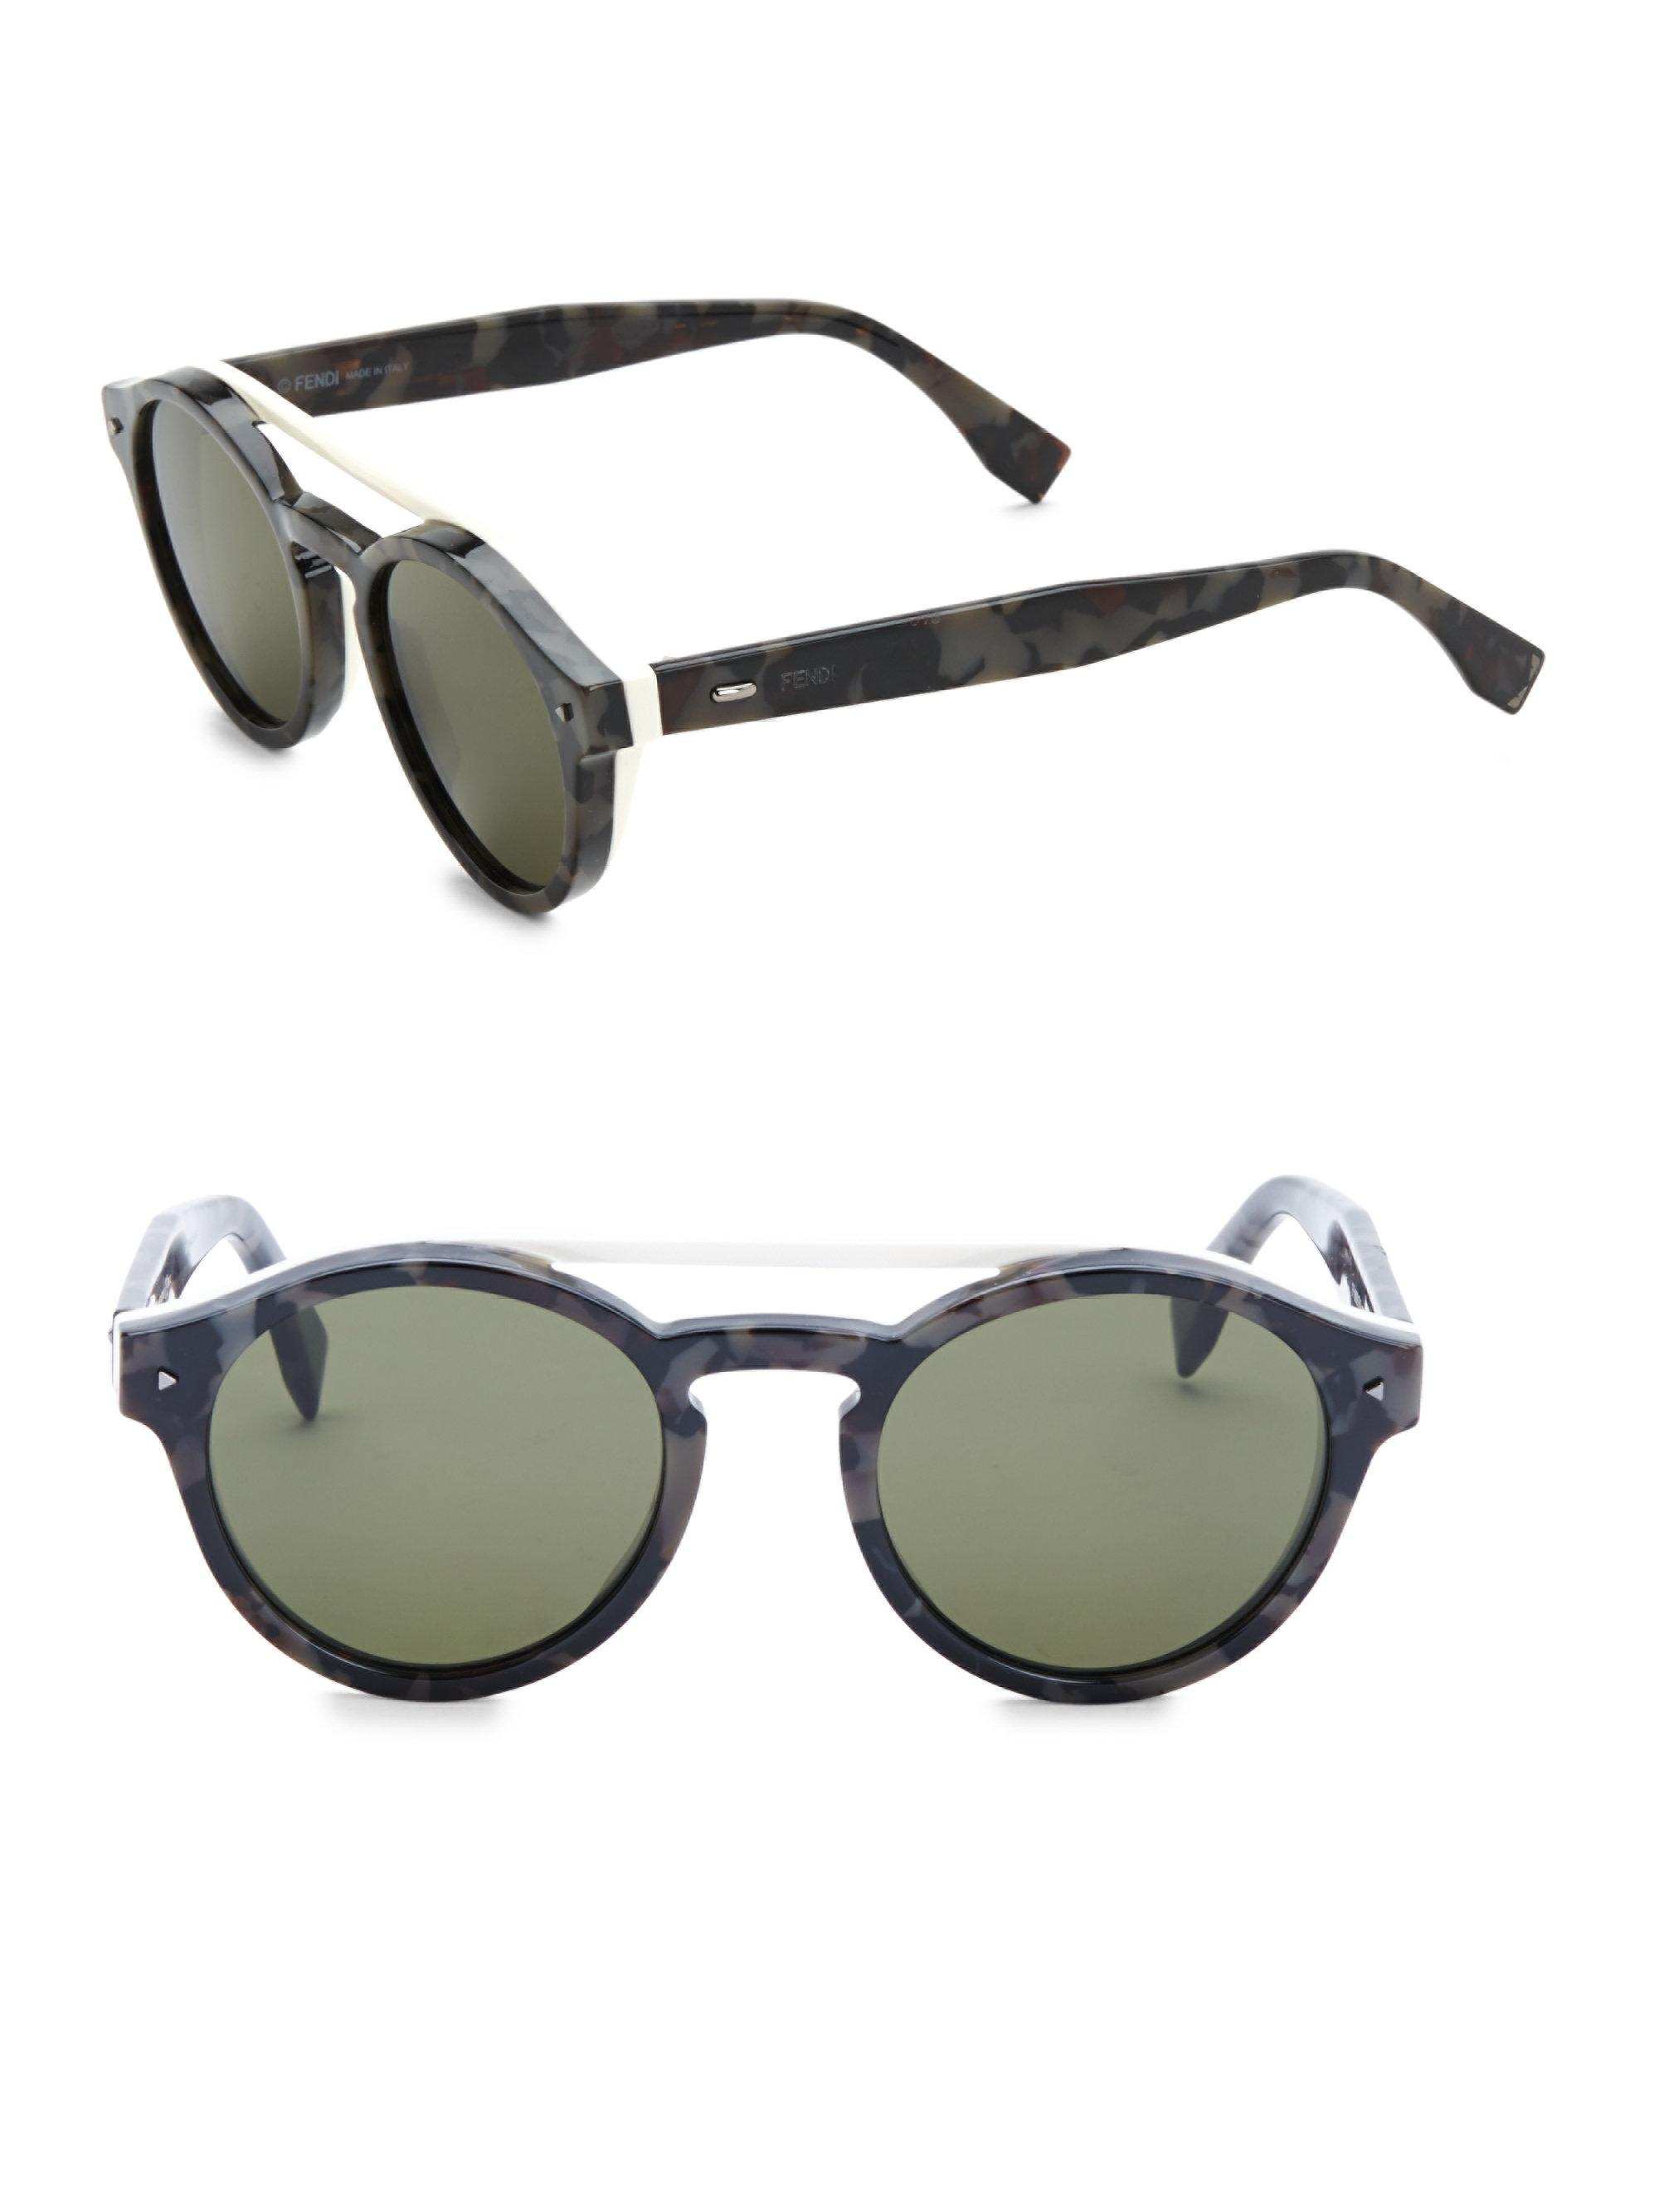 4cfb14821a6 Fendi. Men s Black 51mm Round Sunglasses. £293 From Saks Fifth Avenue